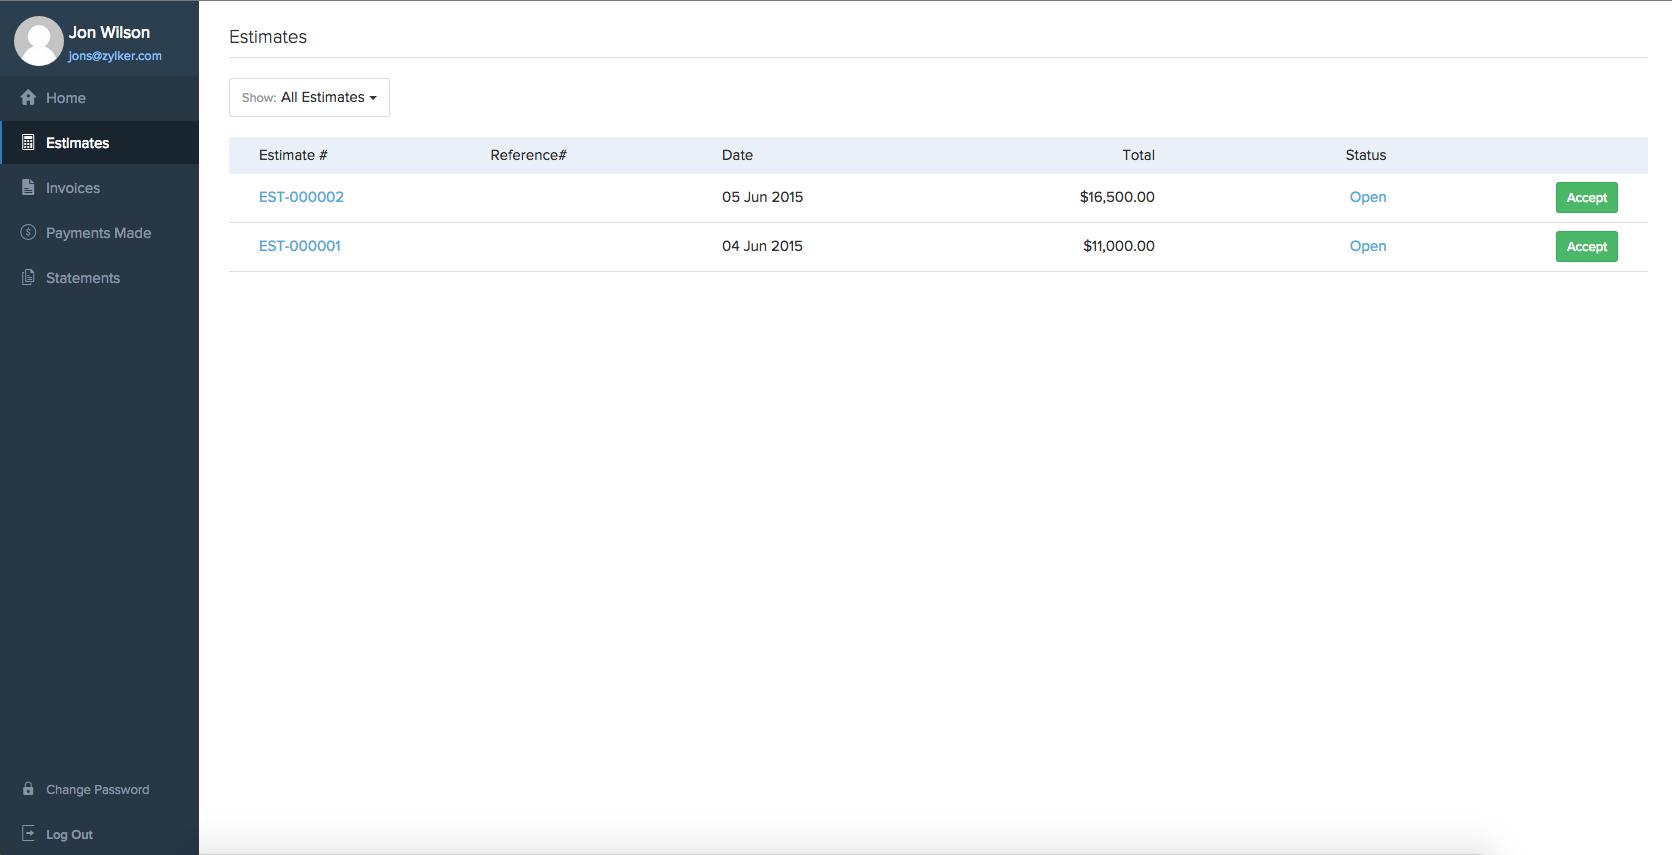 Accepting Estimate in client portal